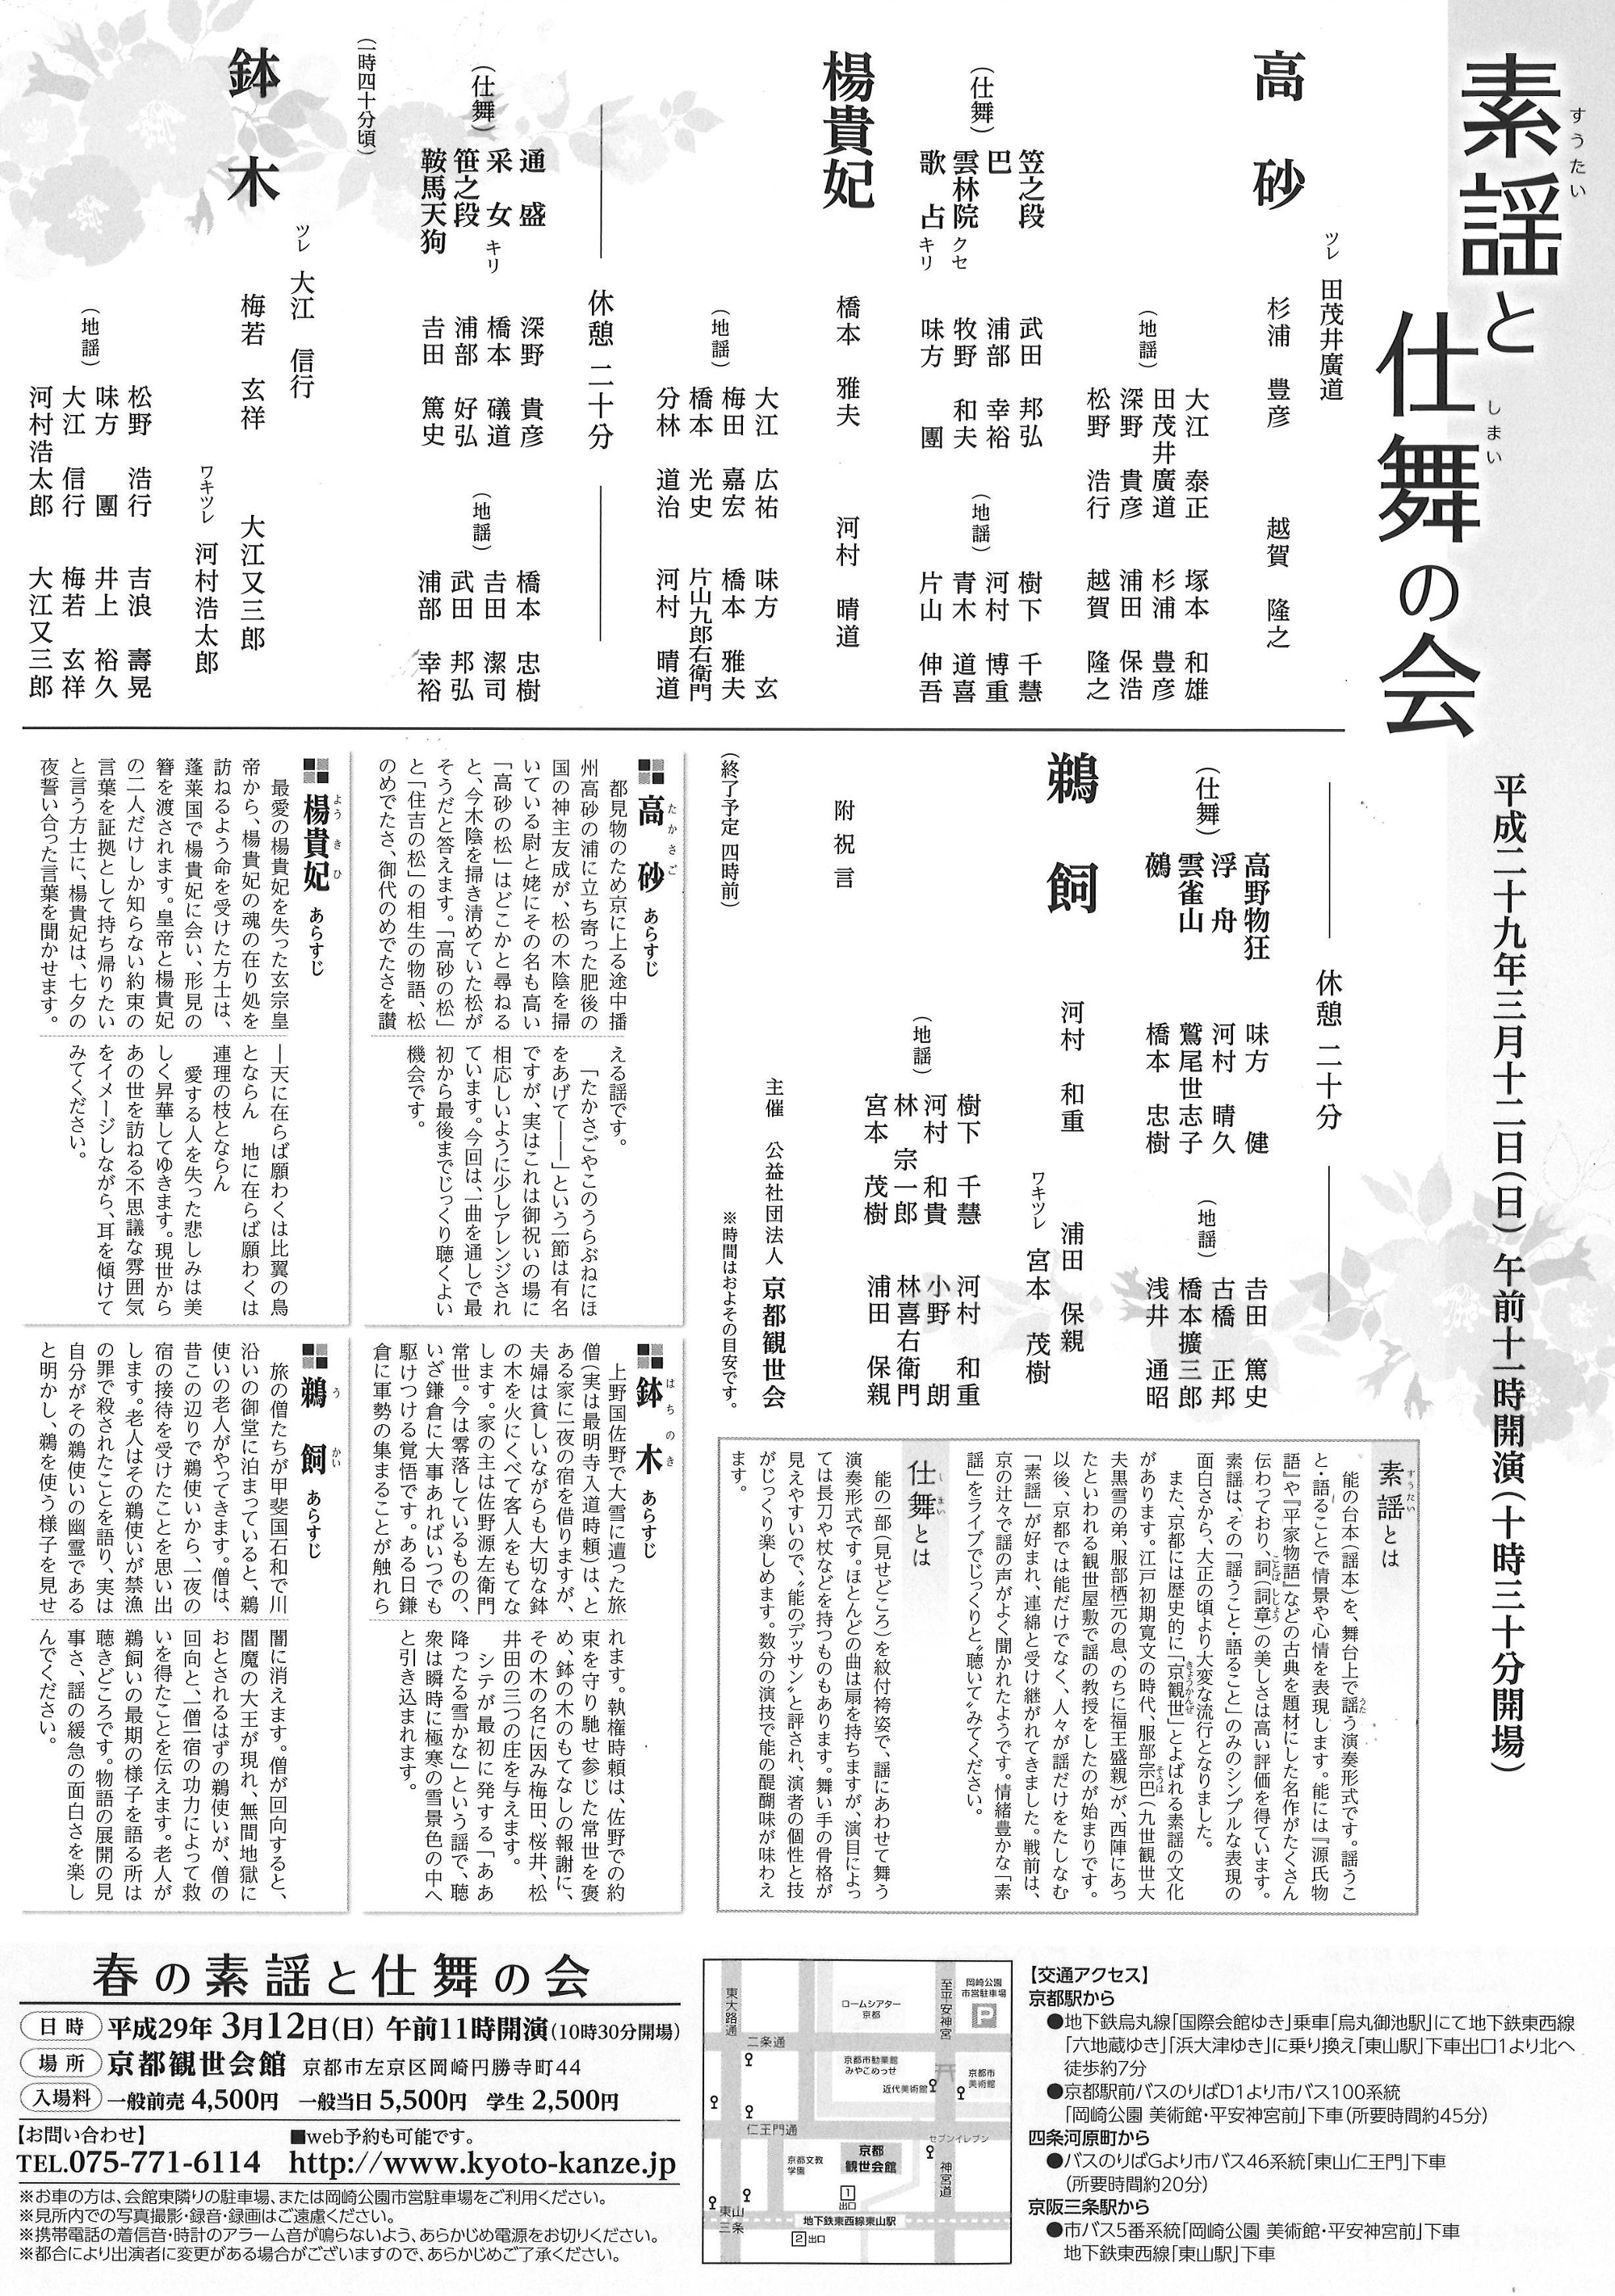 suutai_shimai_ura